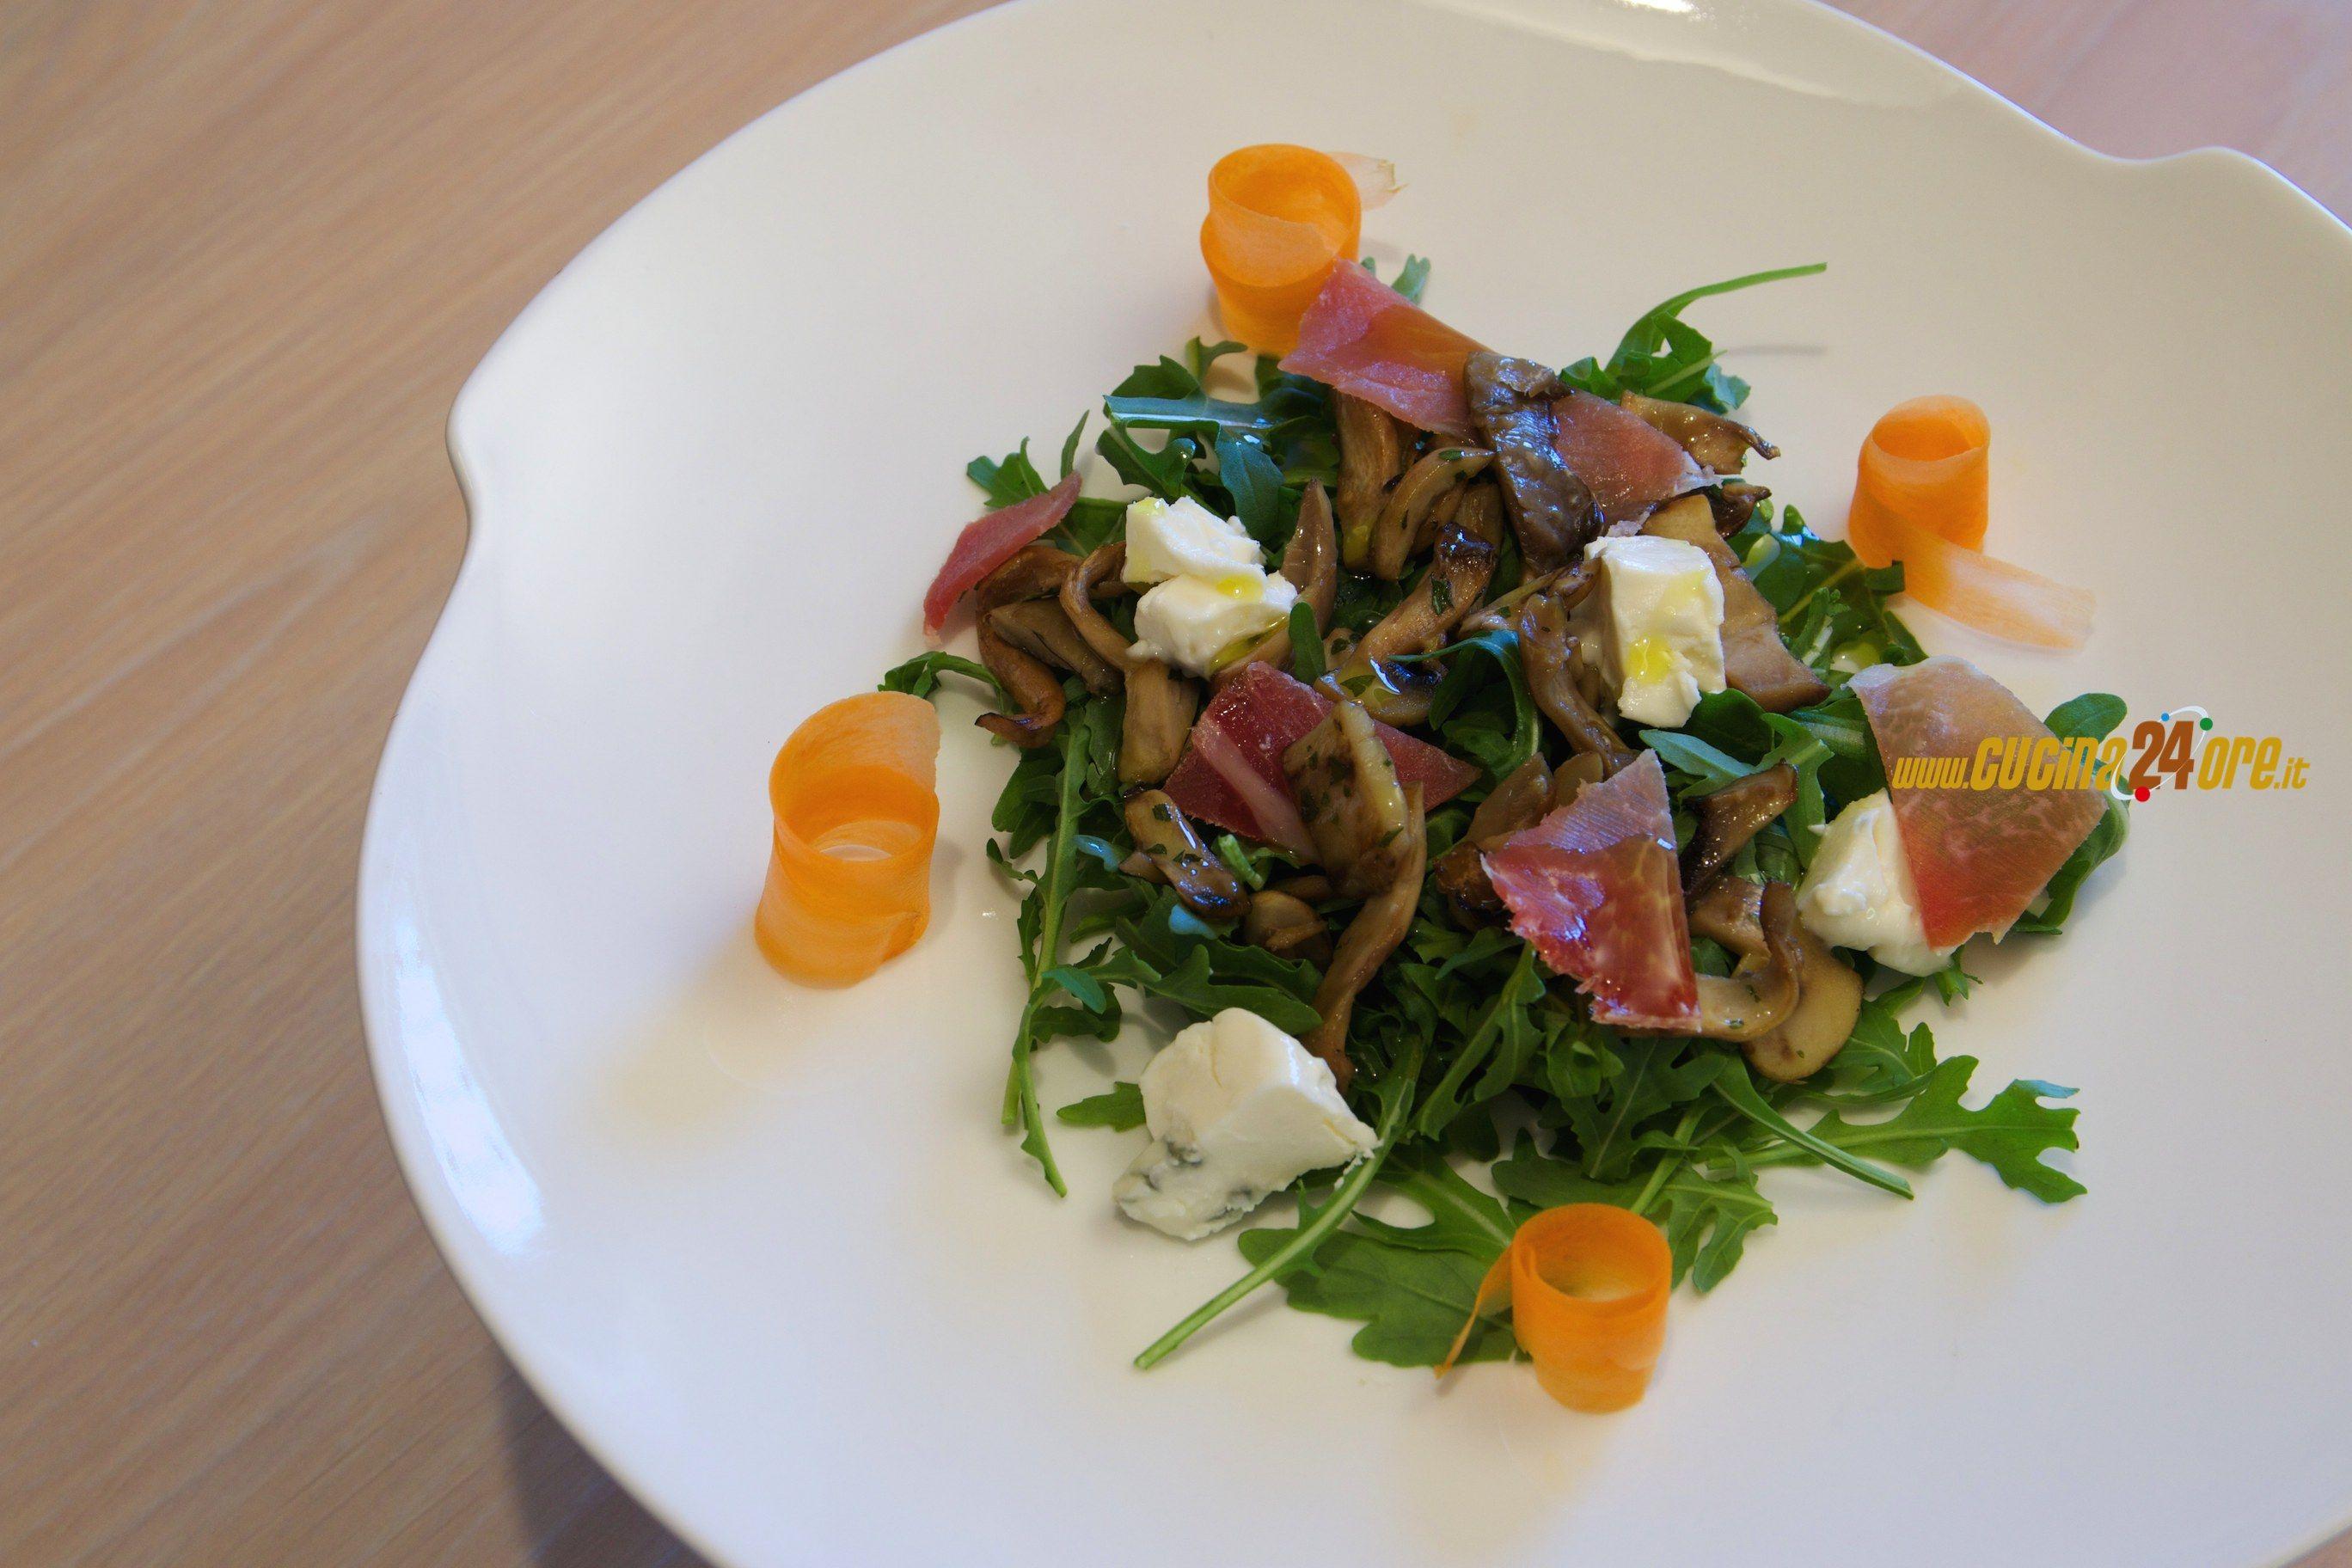 Pranzo Proteico Leggero : Pranzo proteico leggero pranzo proteico e leggero il vostro